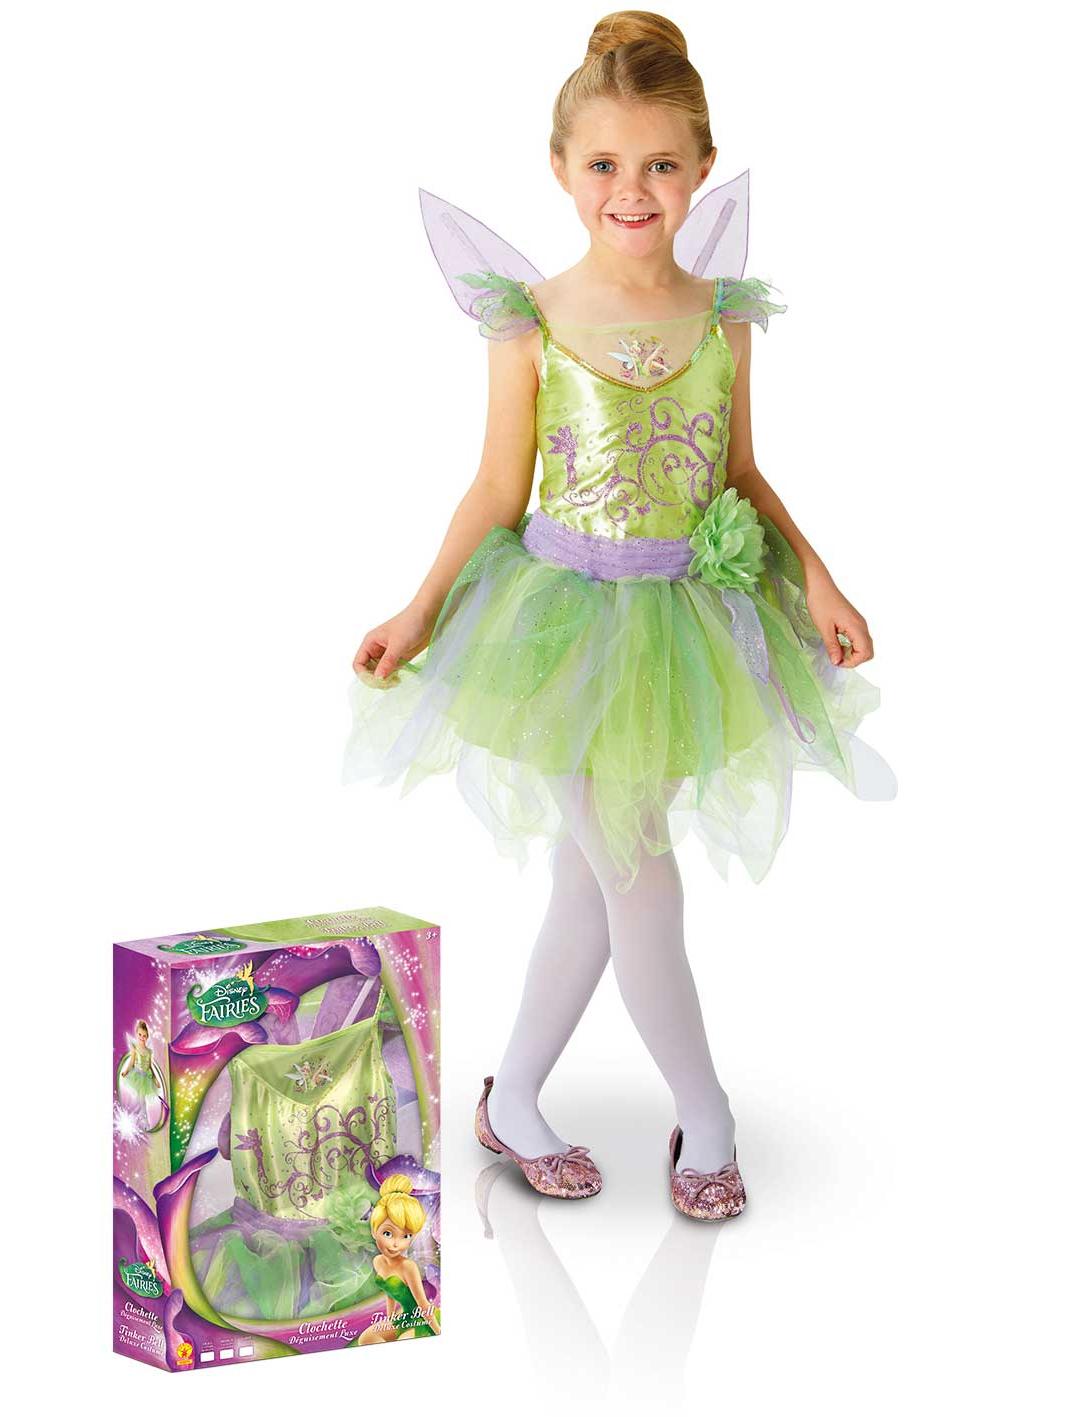 Offizielles Tinkerbell™ Kostüm für Kinder